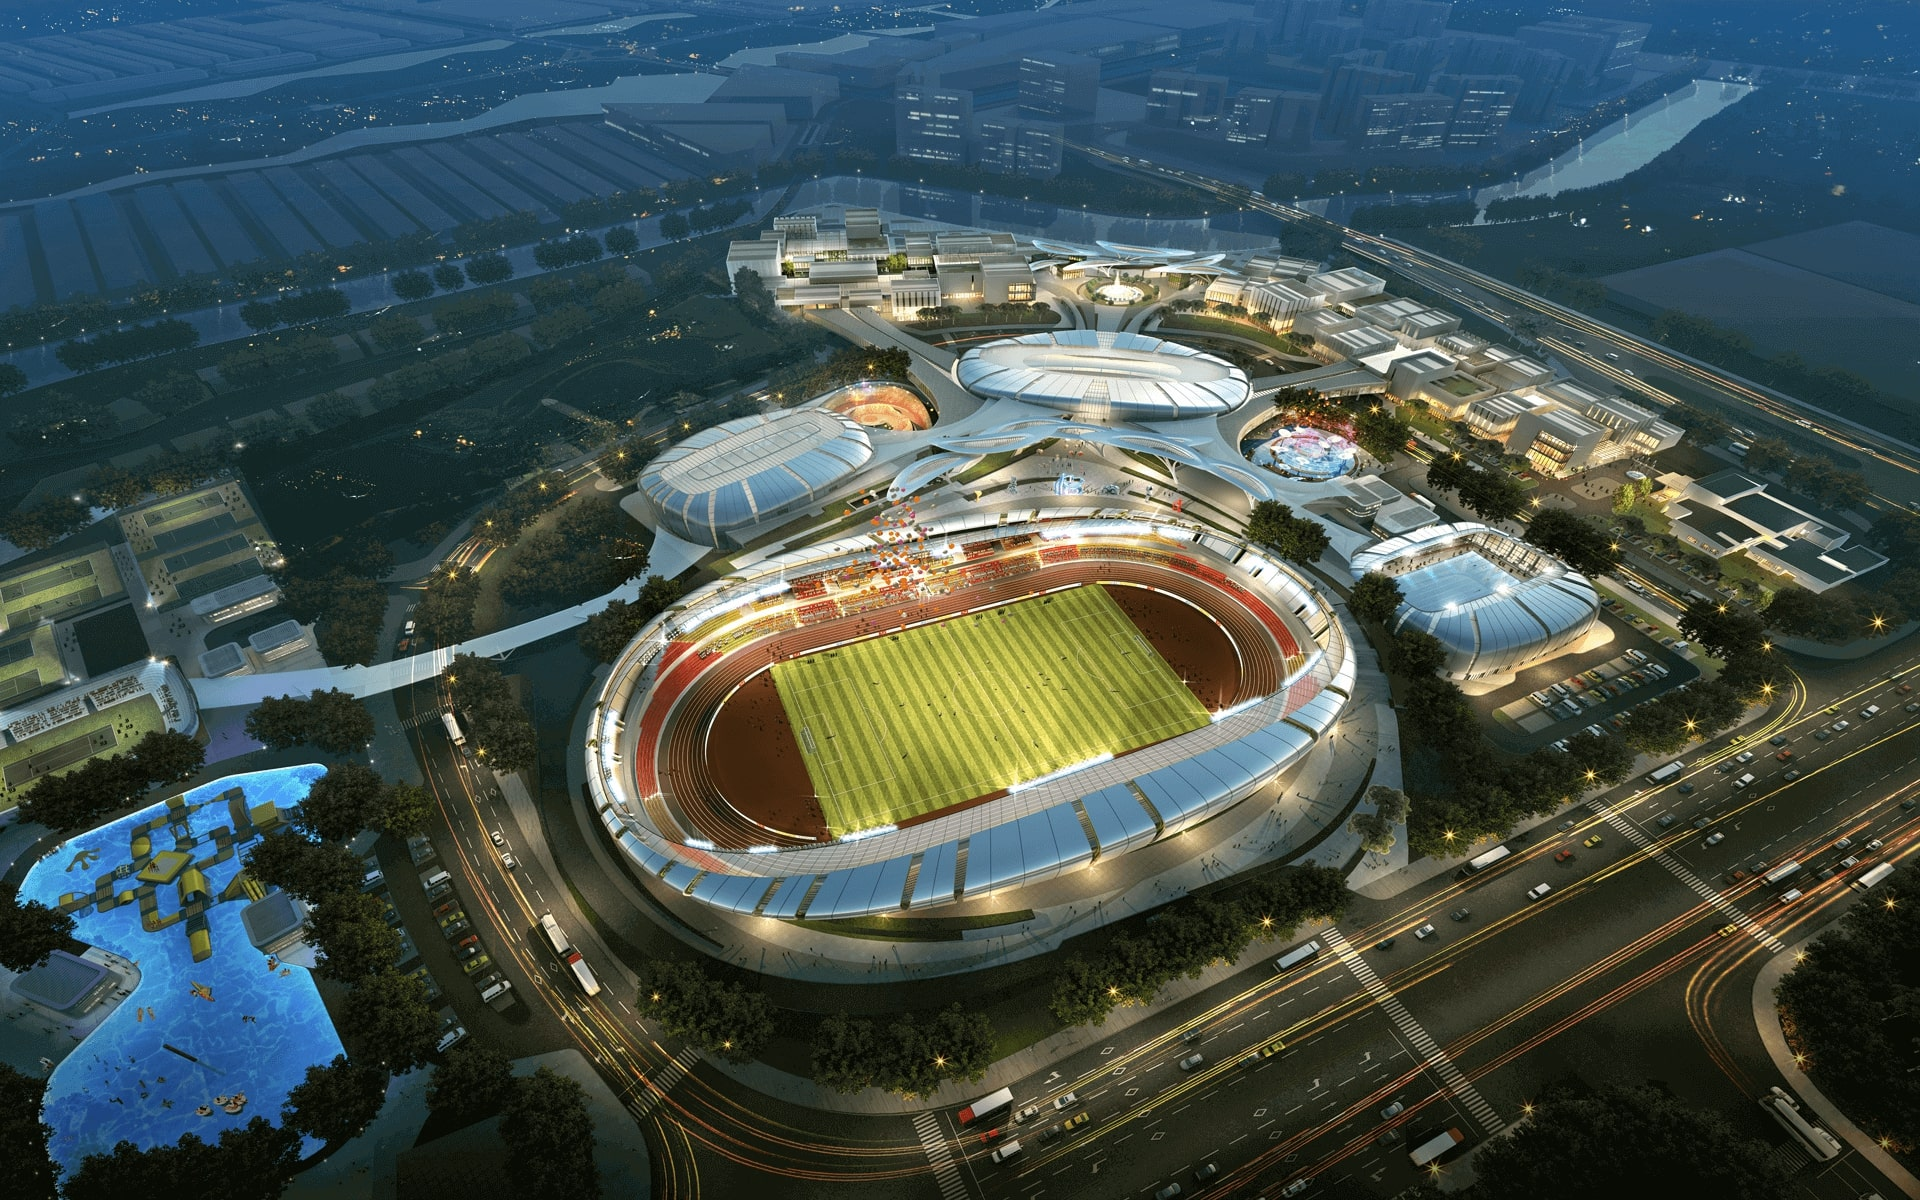 Phối cảnh dự án Saigon Sports City tại quận 2 - Căn hộ Velona Keppel Land.